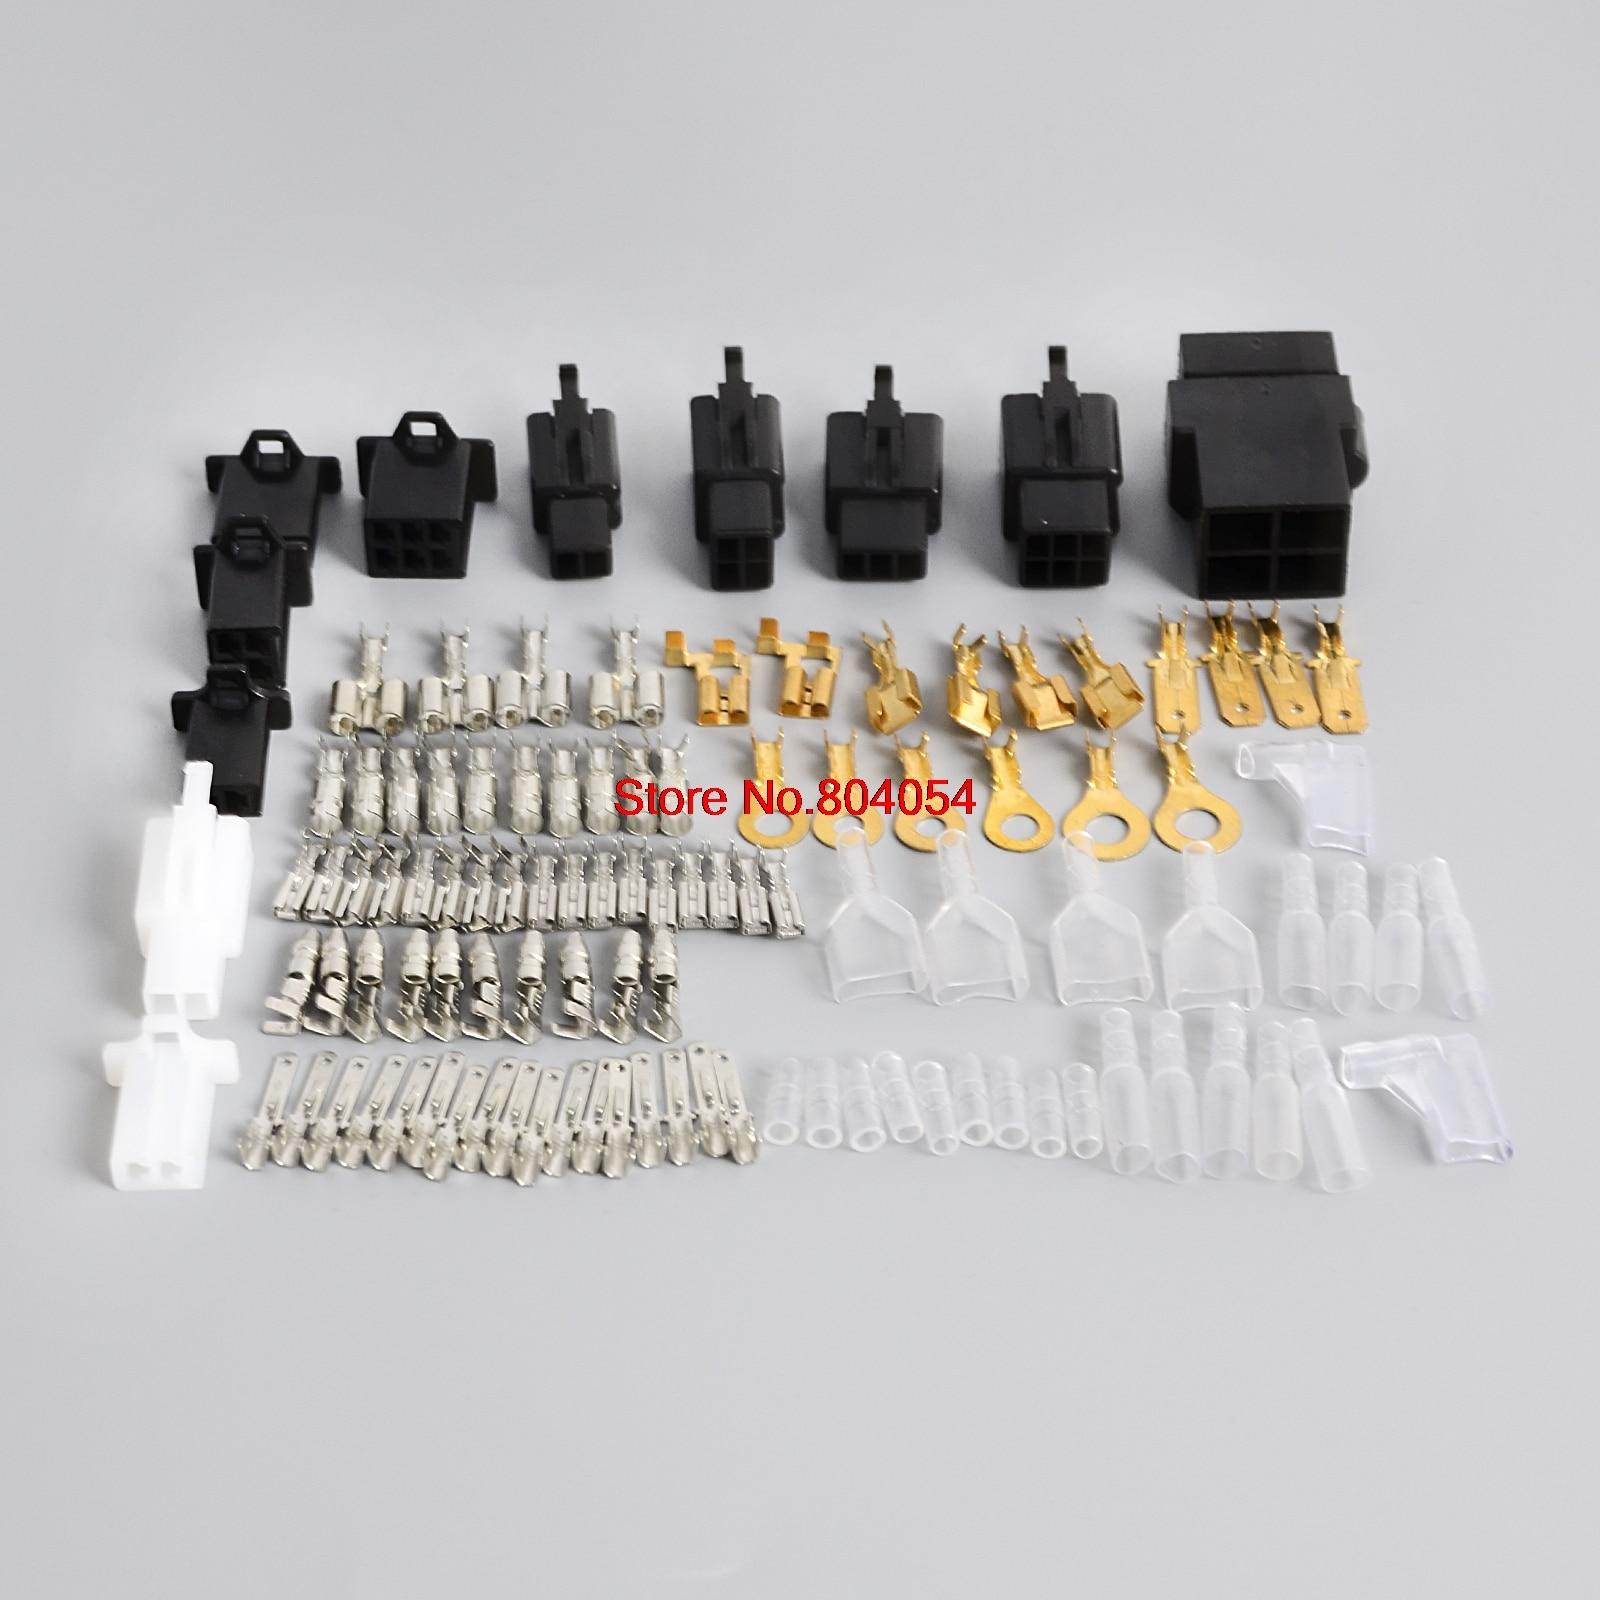 for honda yamaha kawasaki suzuki ducati motorcycle electrical wiring harness loom repair kit plugs bullets connectors in fuses from automobiles  [ 1600 x 1600 Pixel ]